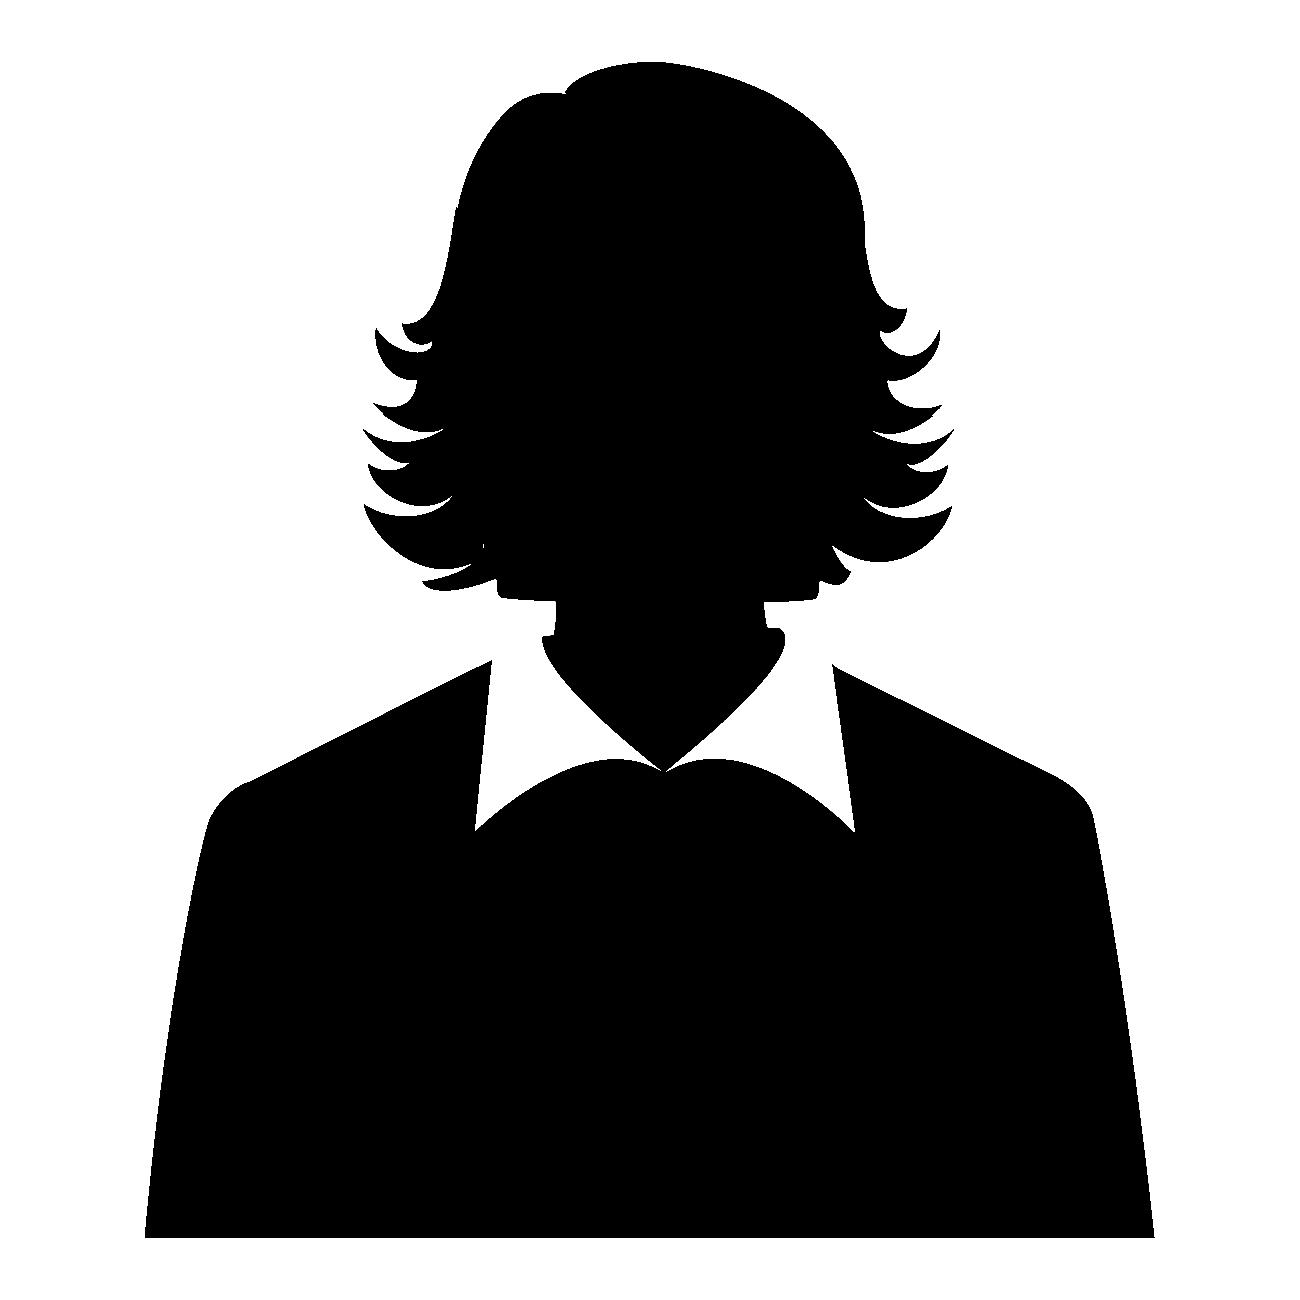 Avatar représentant une femme en chemisier